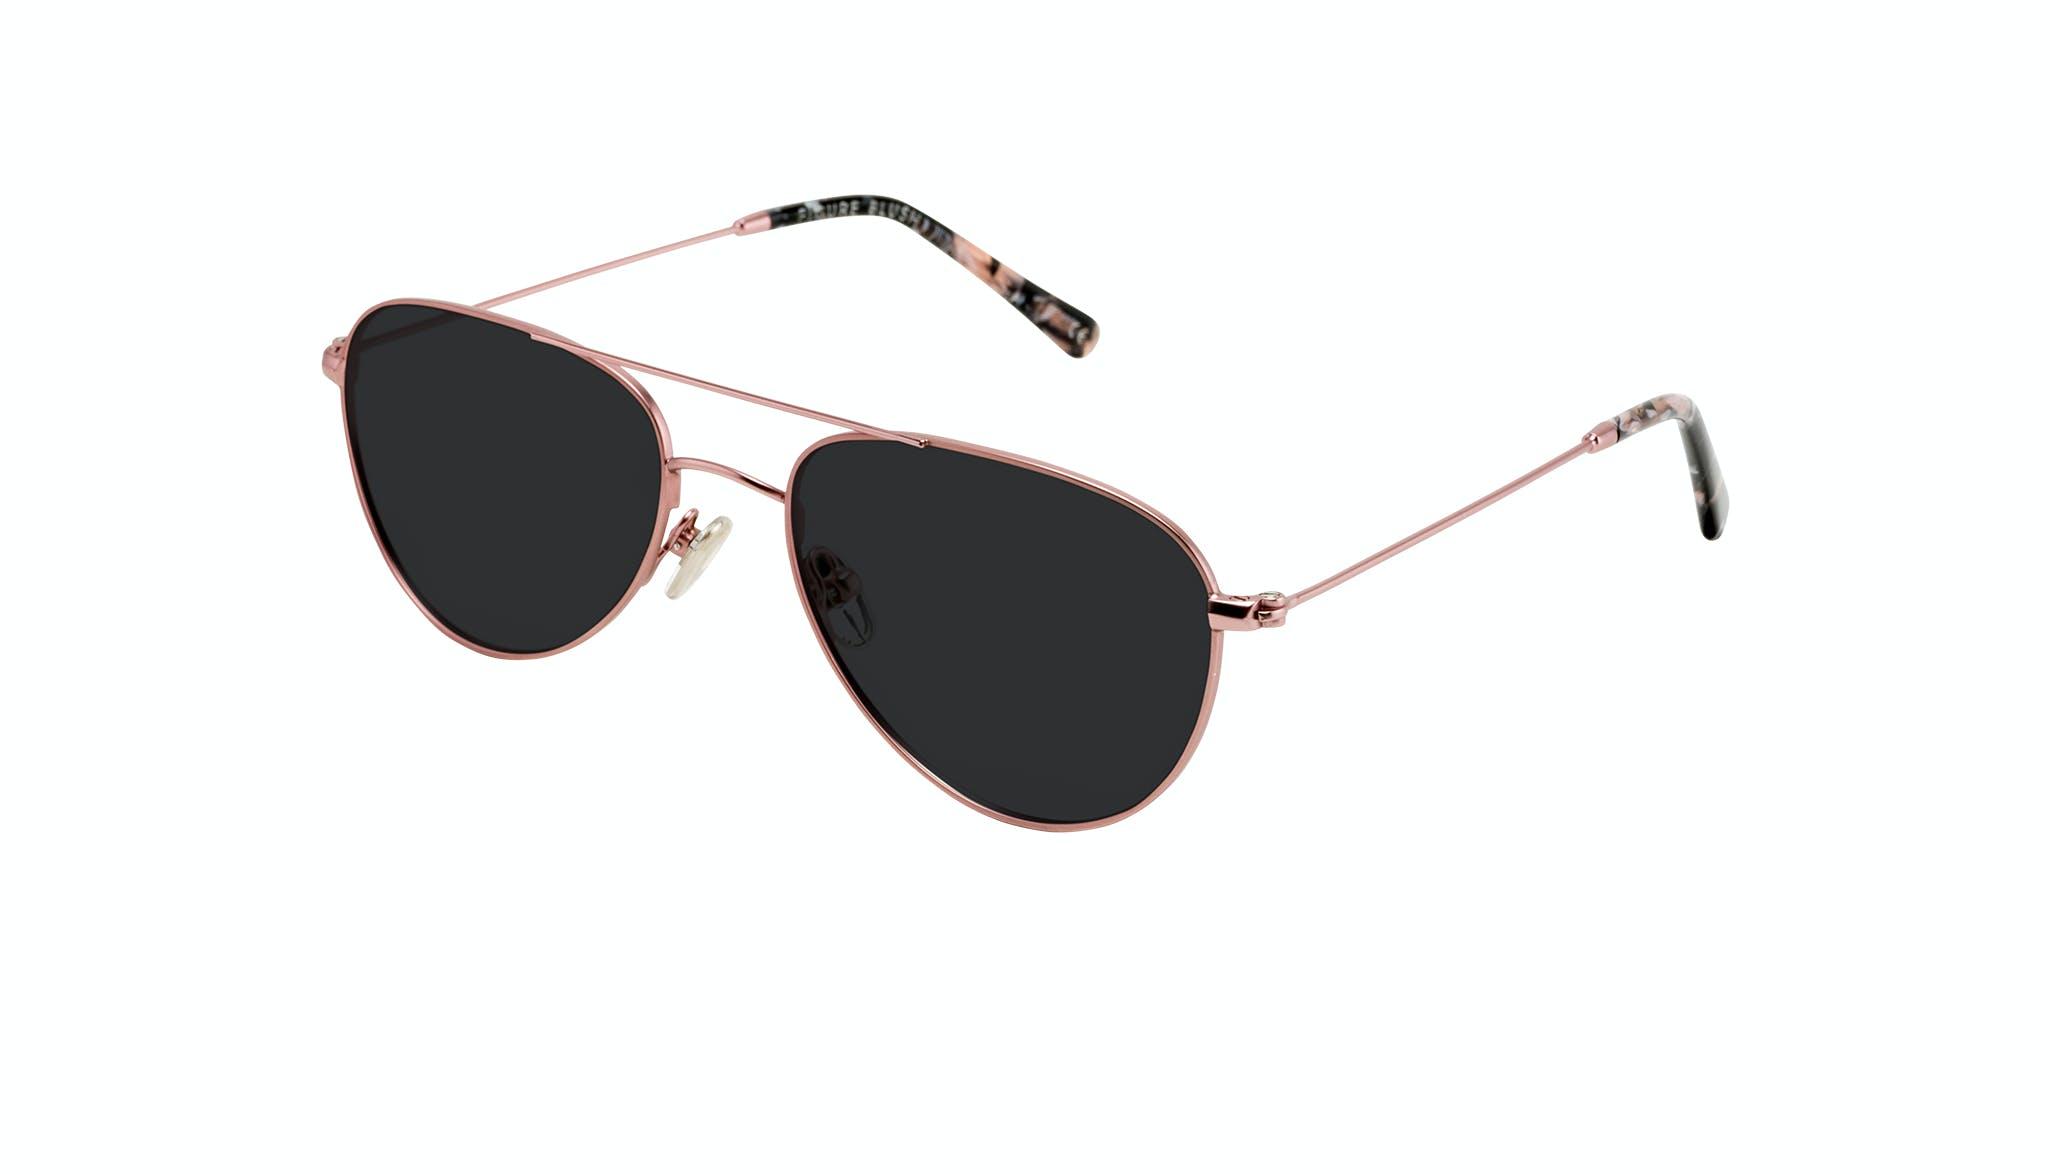 Affordable Fashion Glasses Aviator Sunglasses Women Figure Blush Tilt